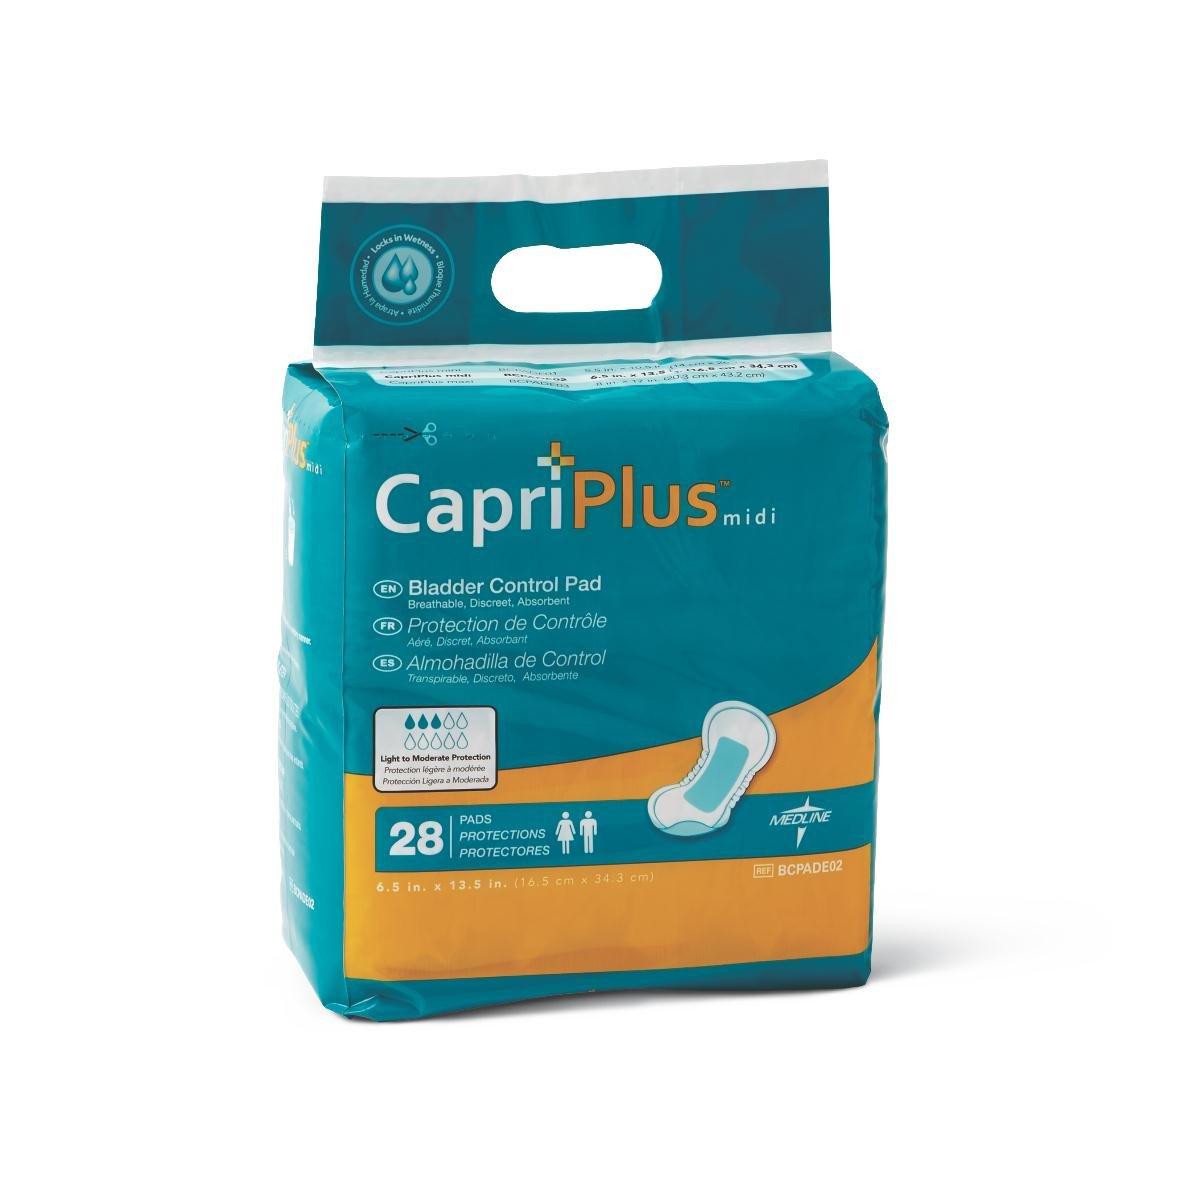 Medline BCPE02 Capri Plus Bladder Control Pads, 6.5'' x 13.5'' (Pack of 28)